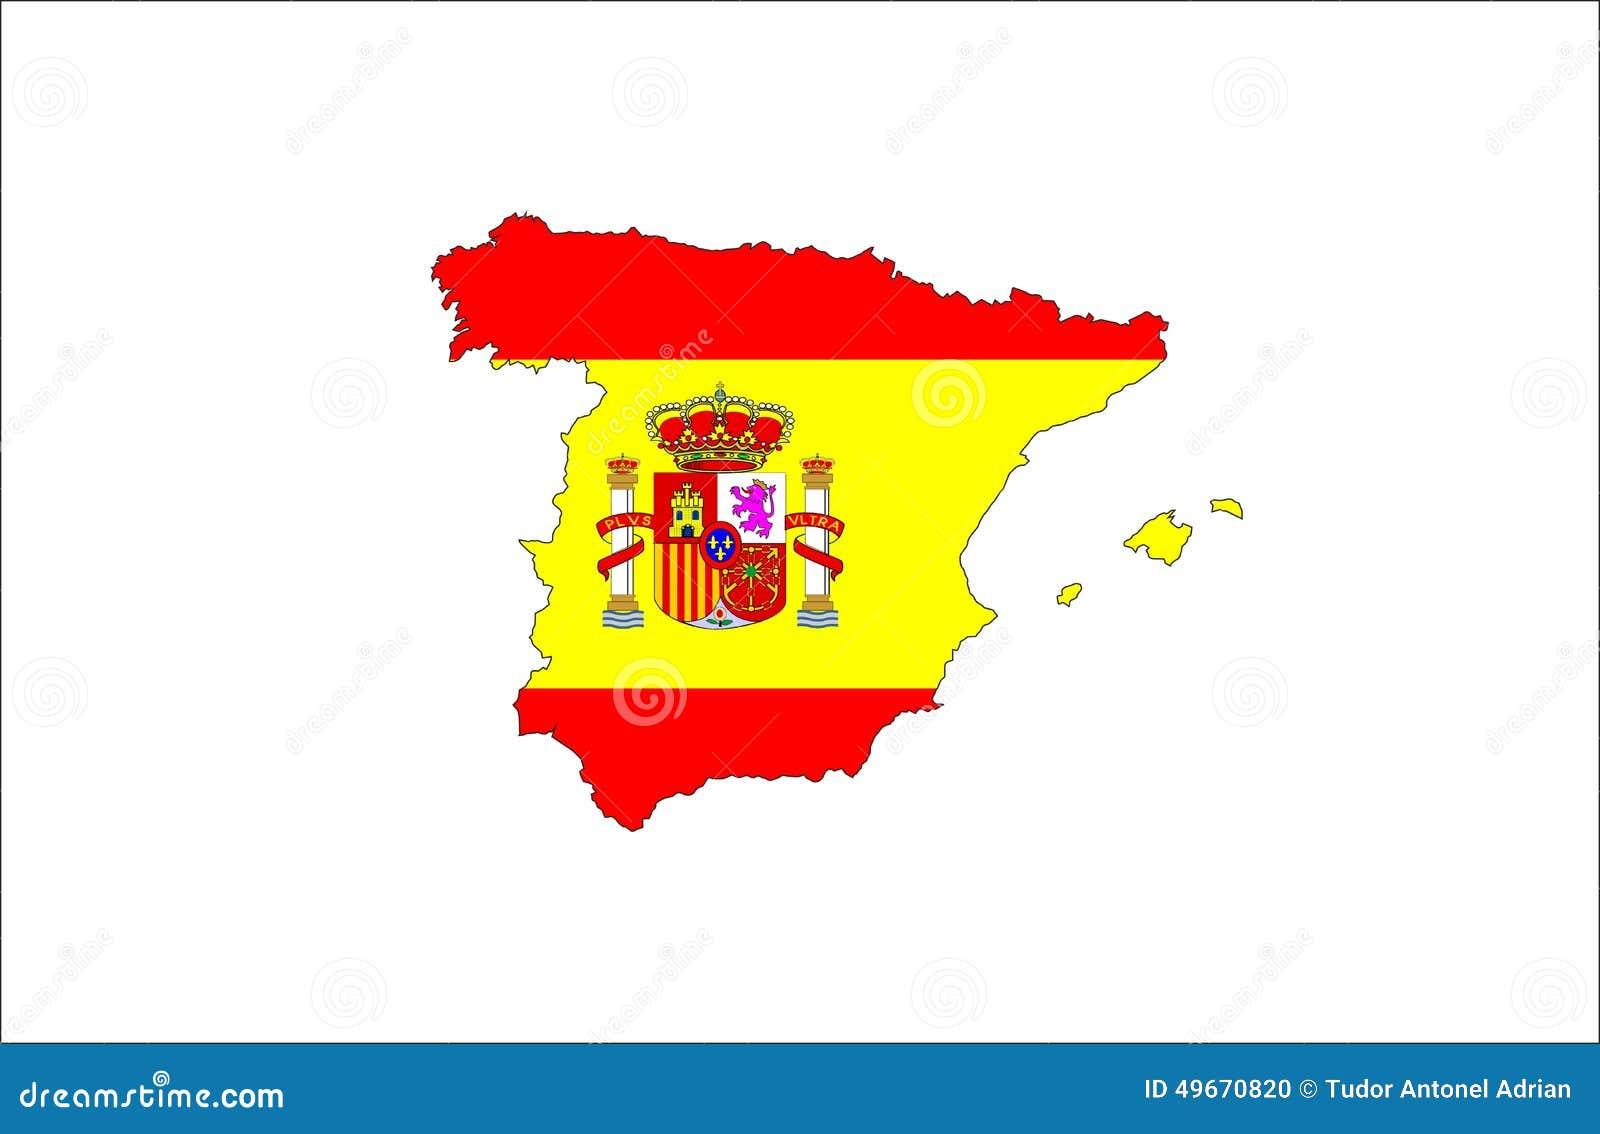 how to make spanish symbols